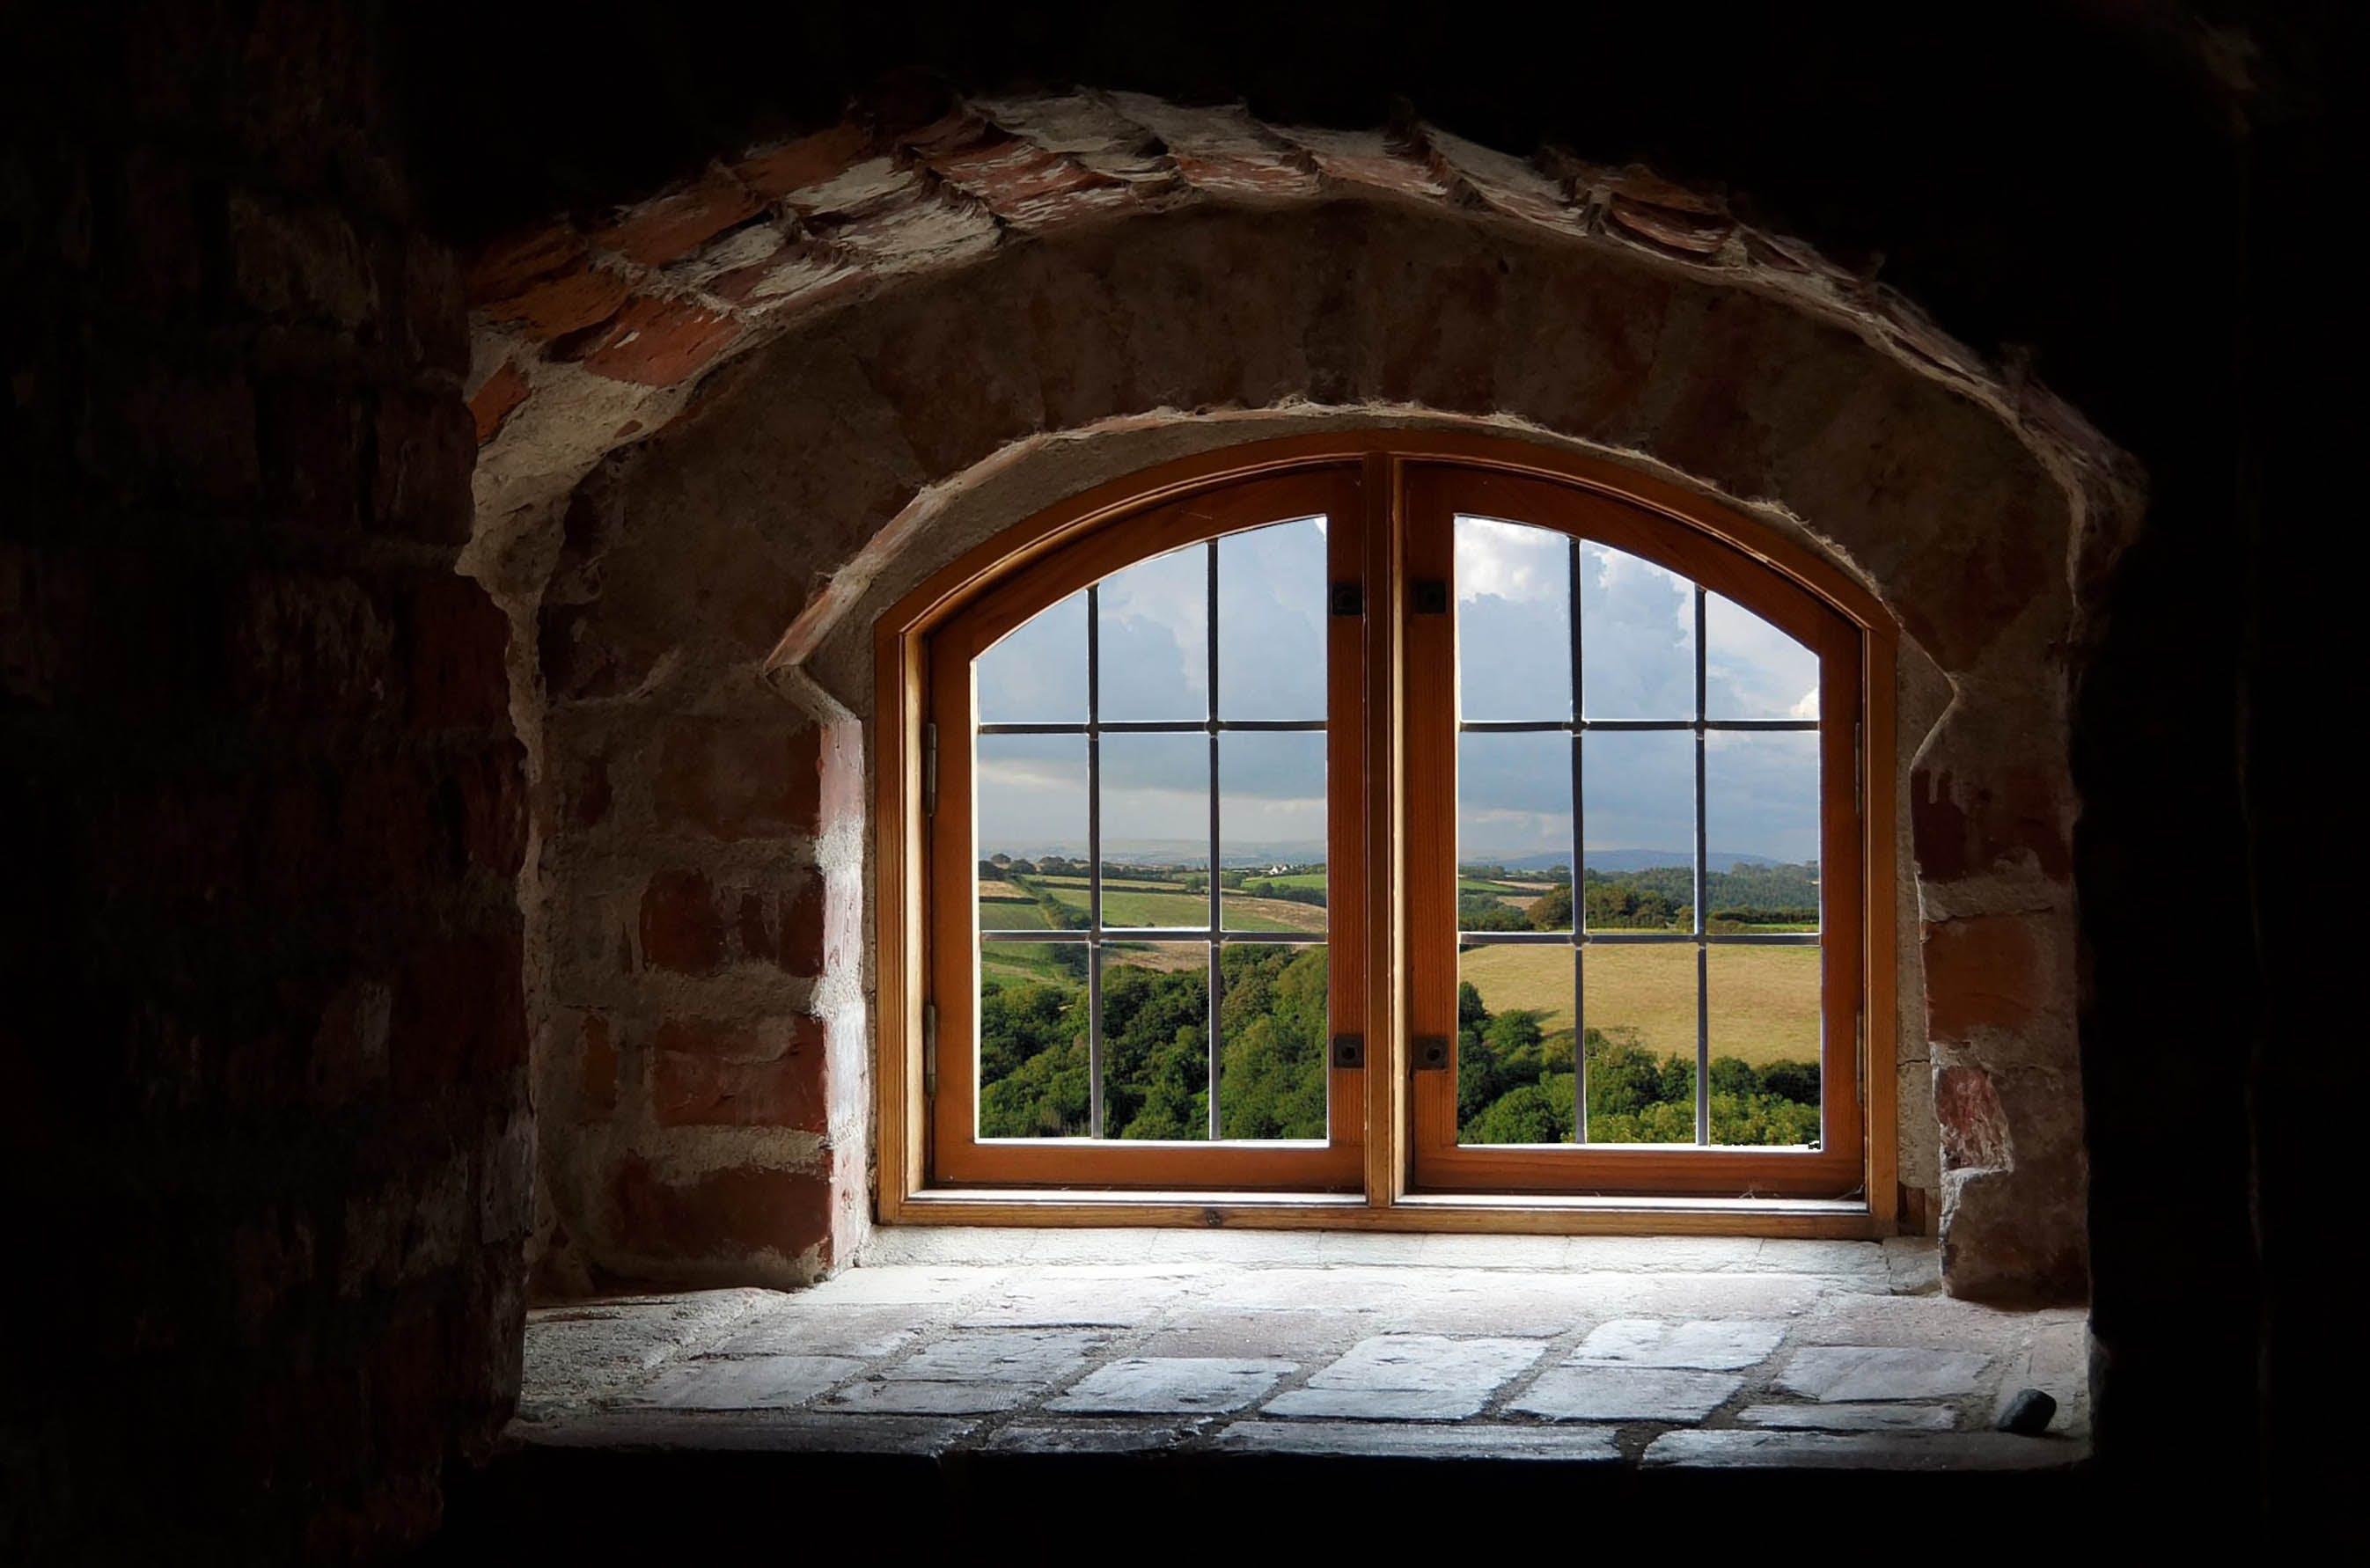 Window of House